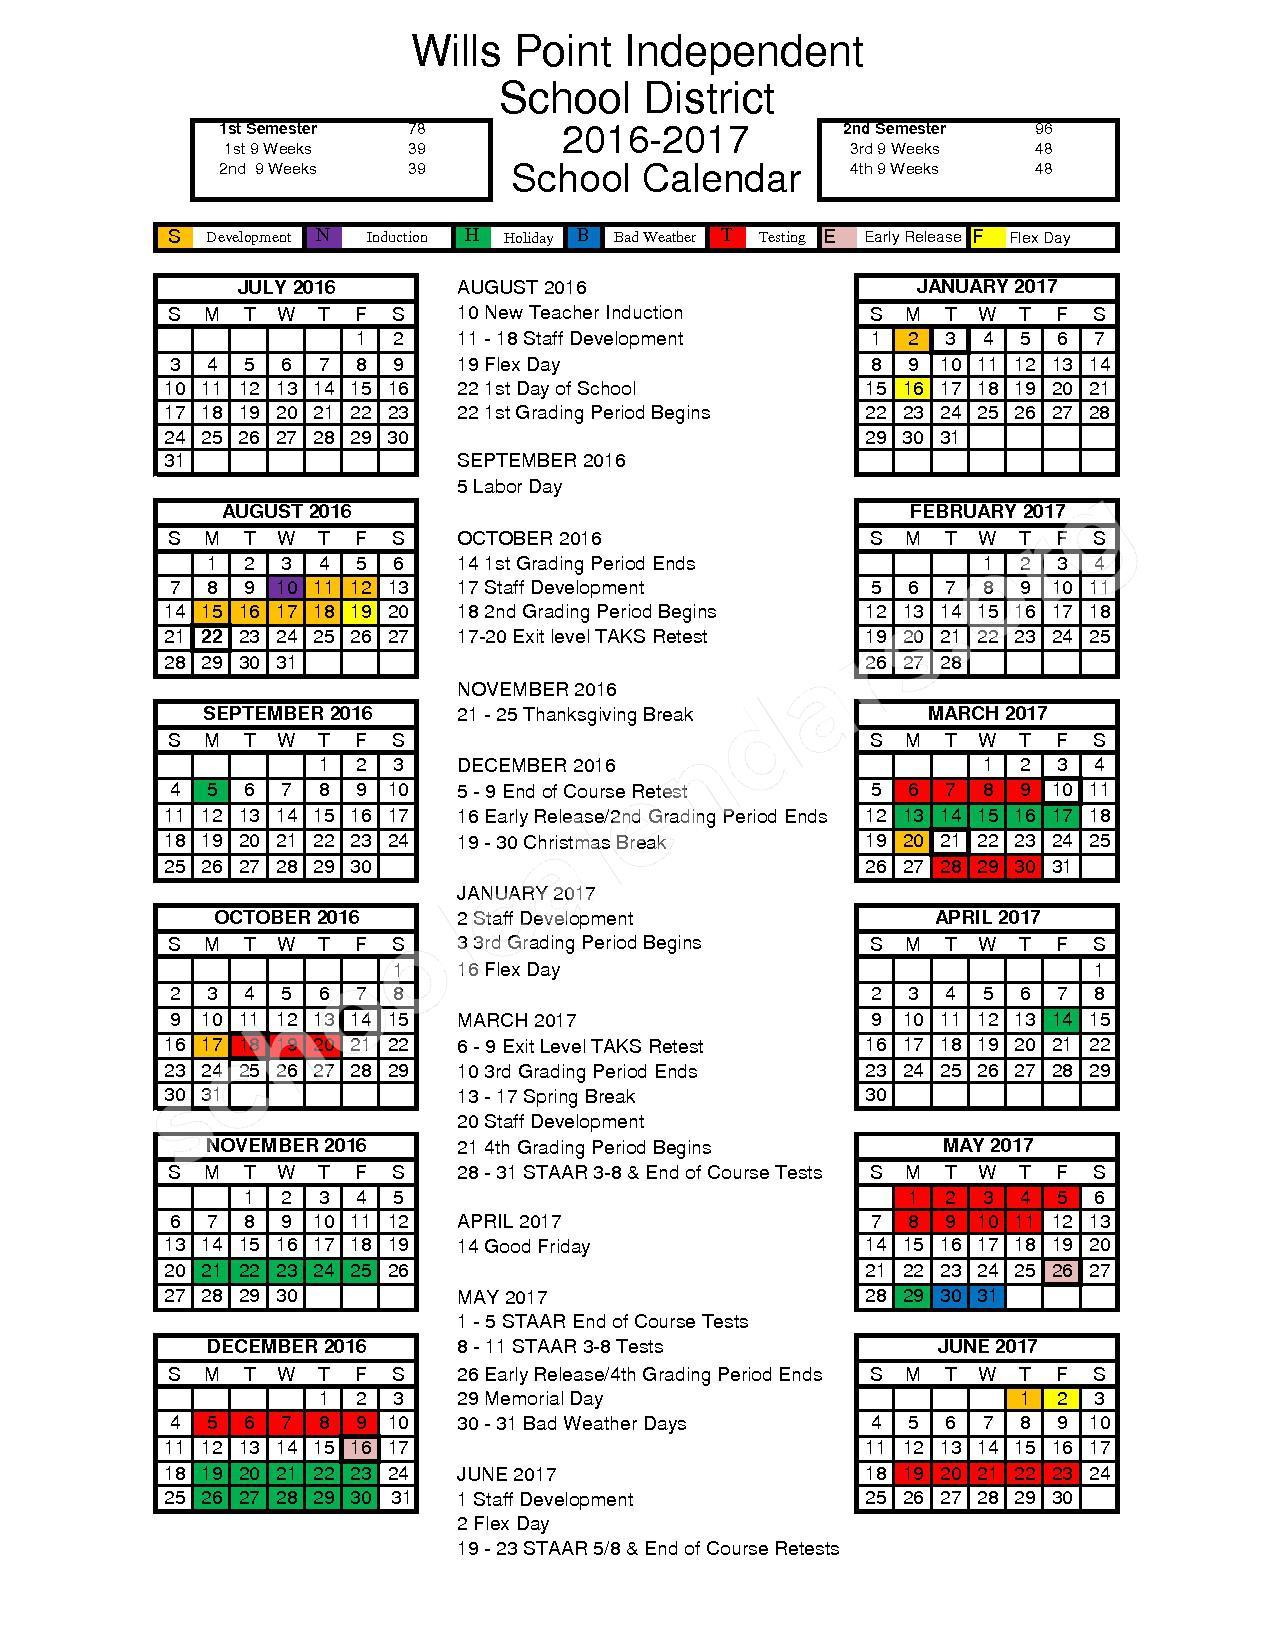 Wills Point Independent School District Calendars Texas